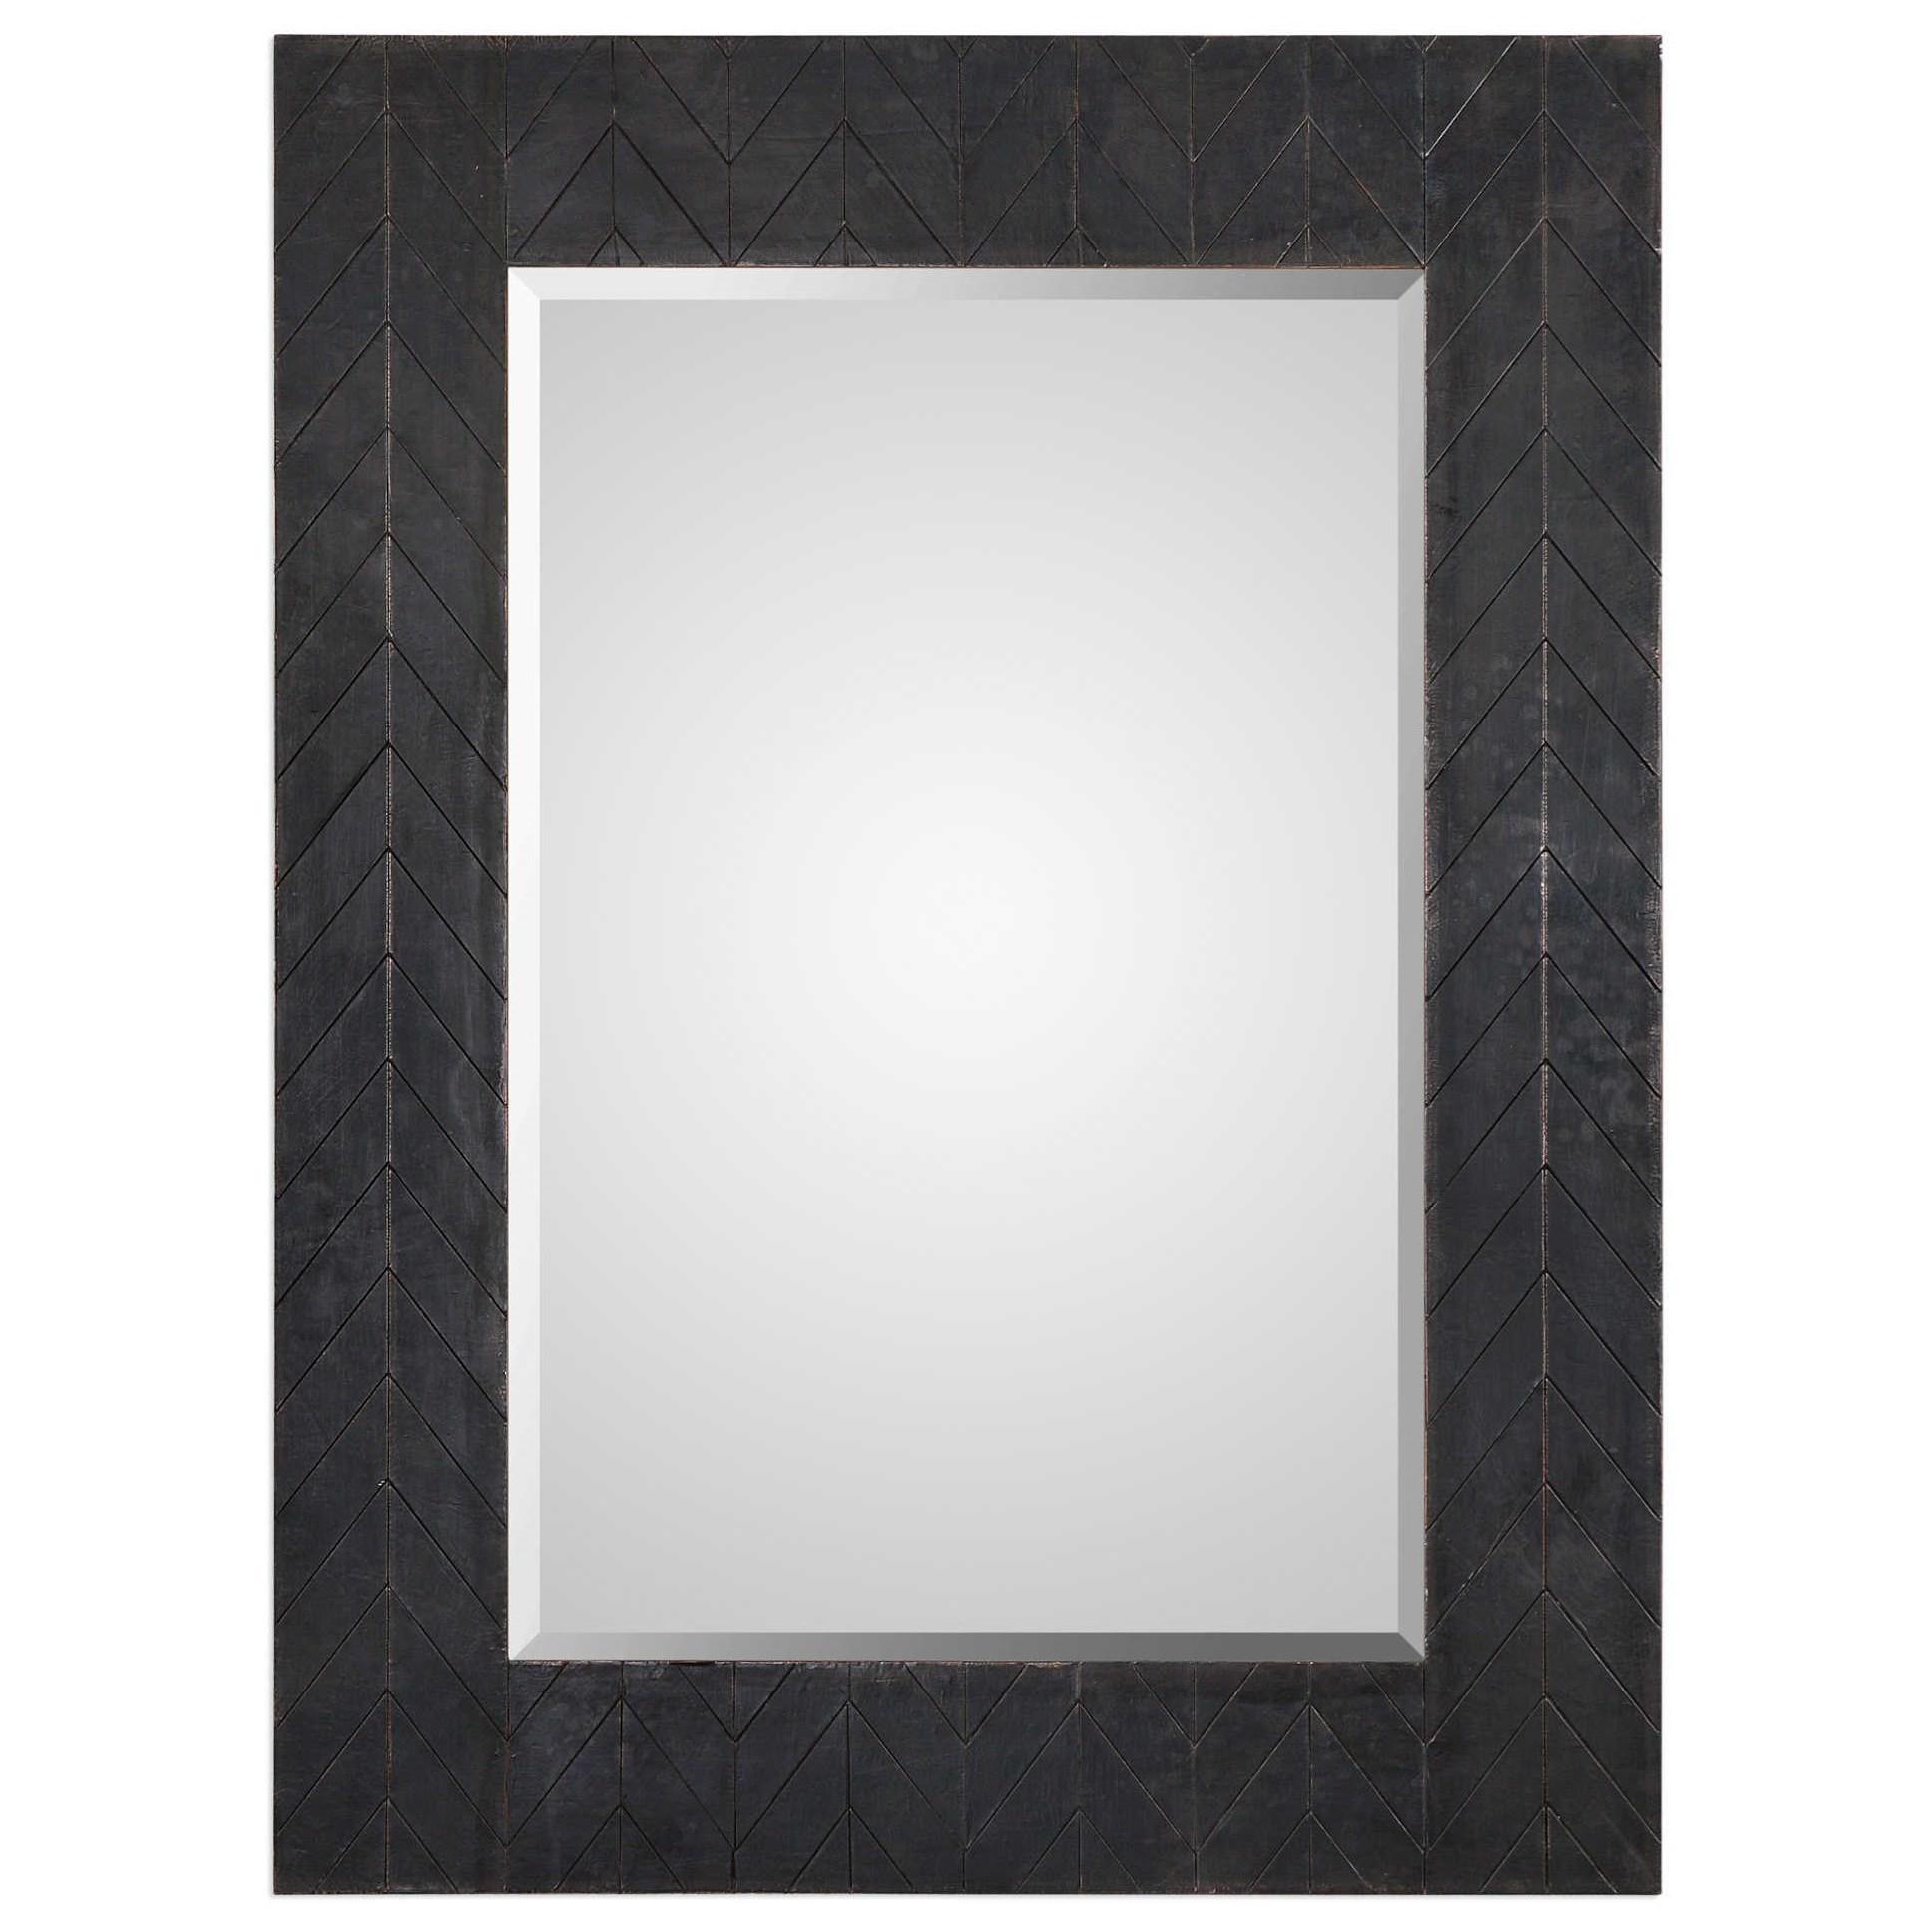 Mirrors Caprione Oxidized Dark Copper Mirror by Uttermost at Mueller Furniture